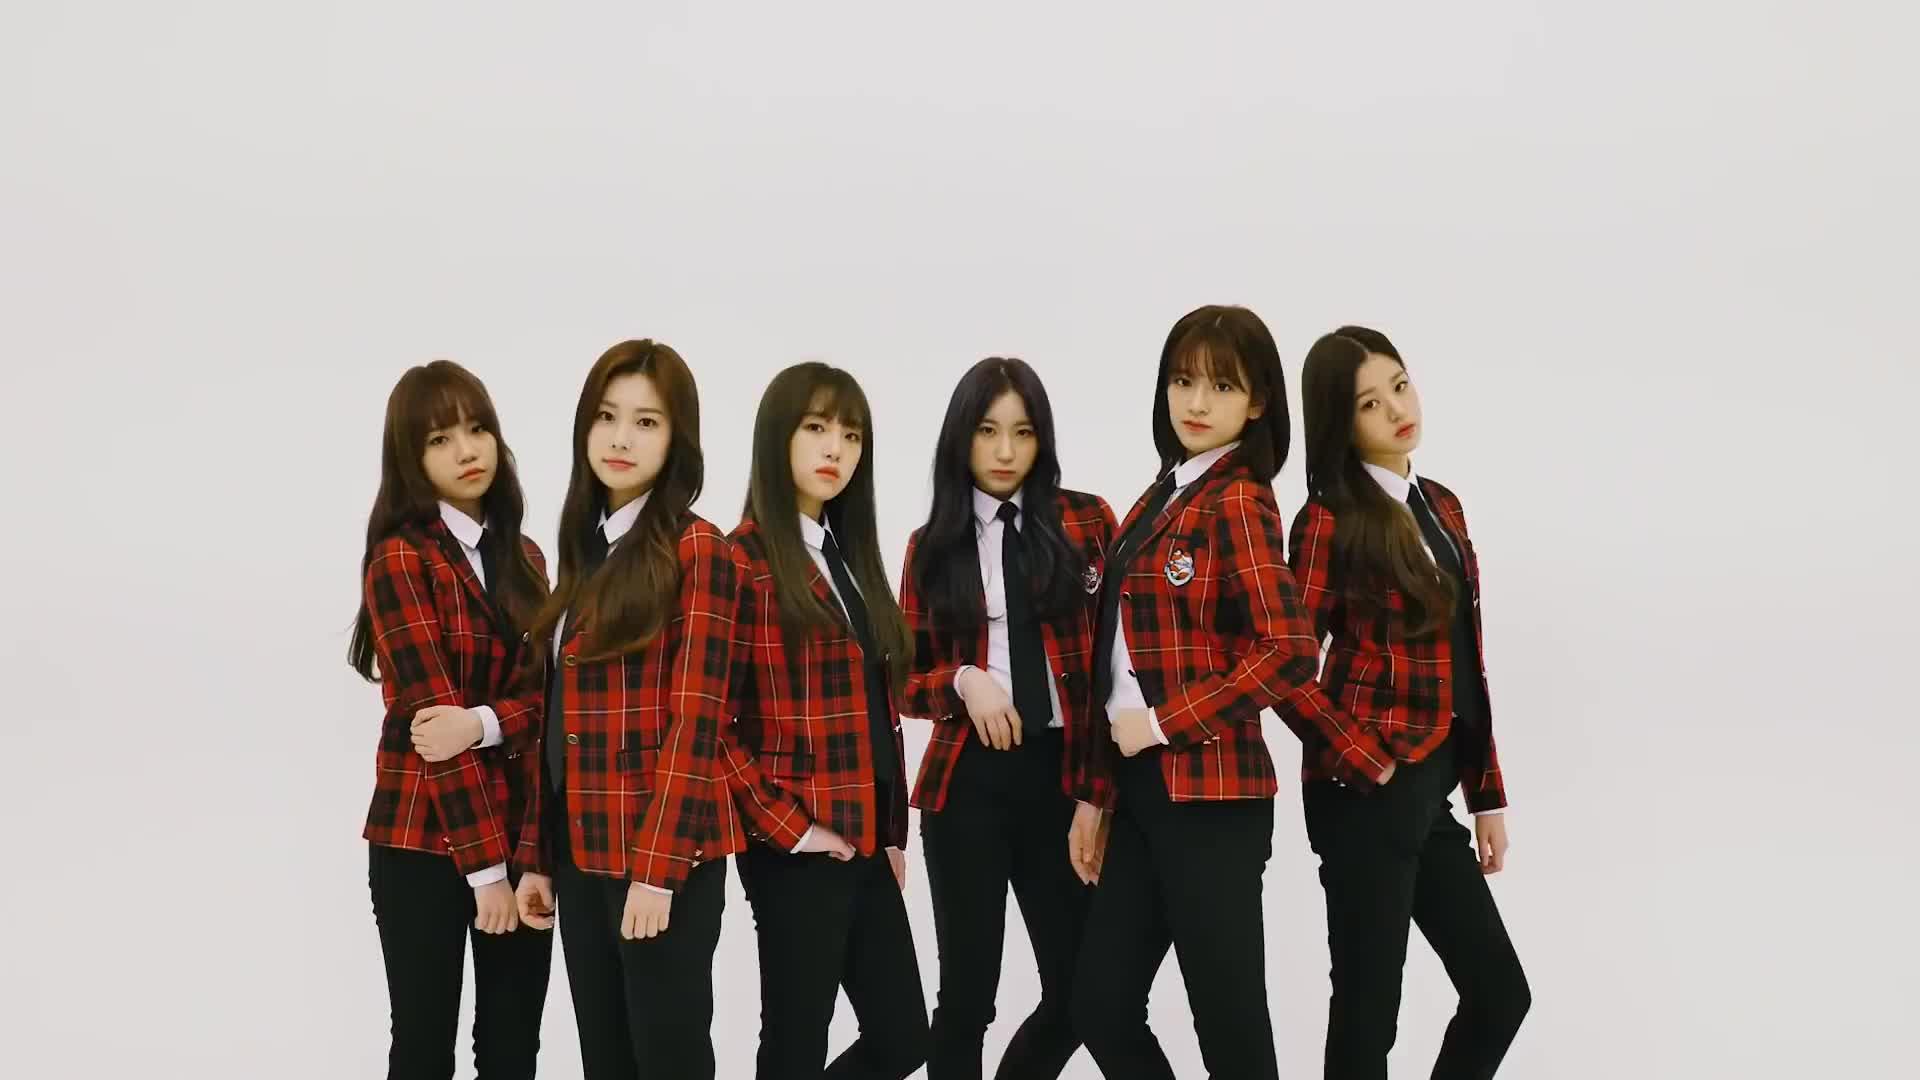 chaeyeon, hyewon, izone, wonyoung, yena, yujin, yuri, skoolooks izone GIFs